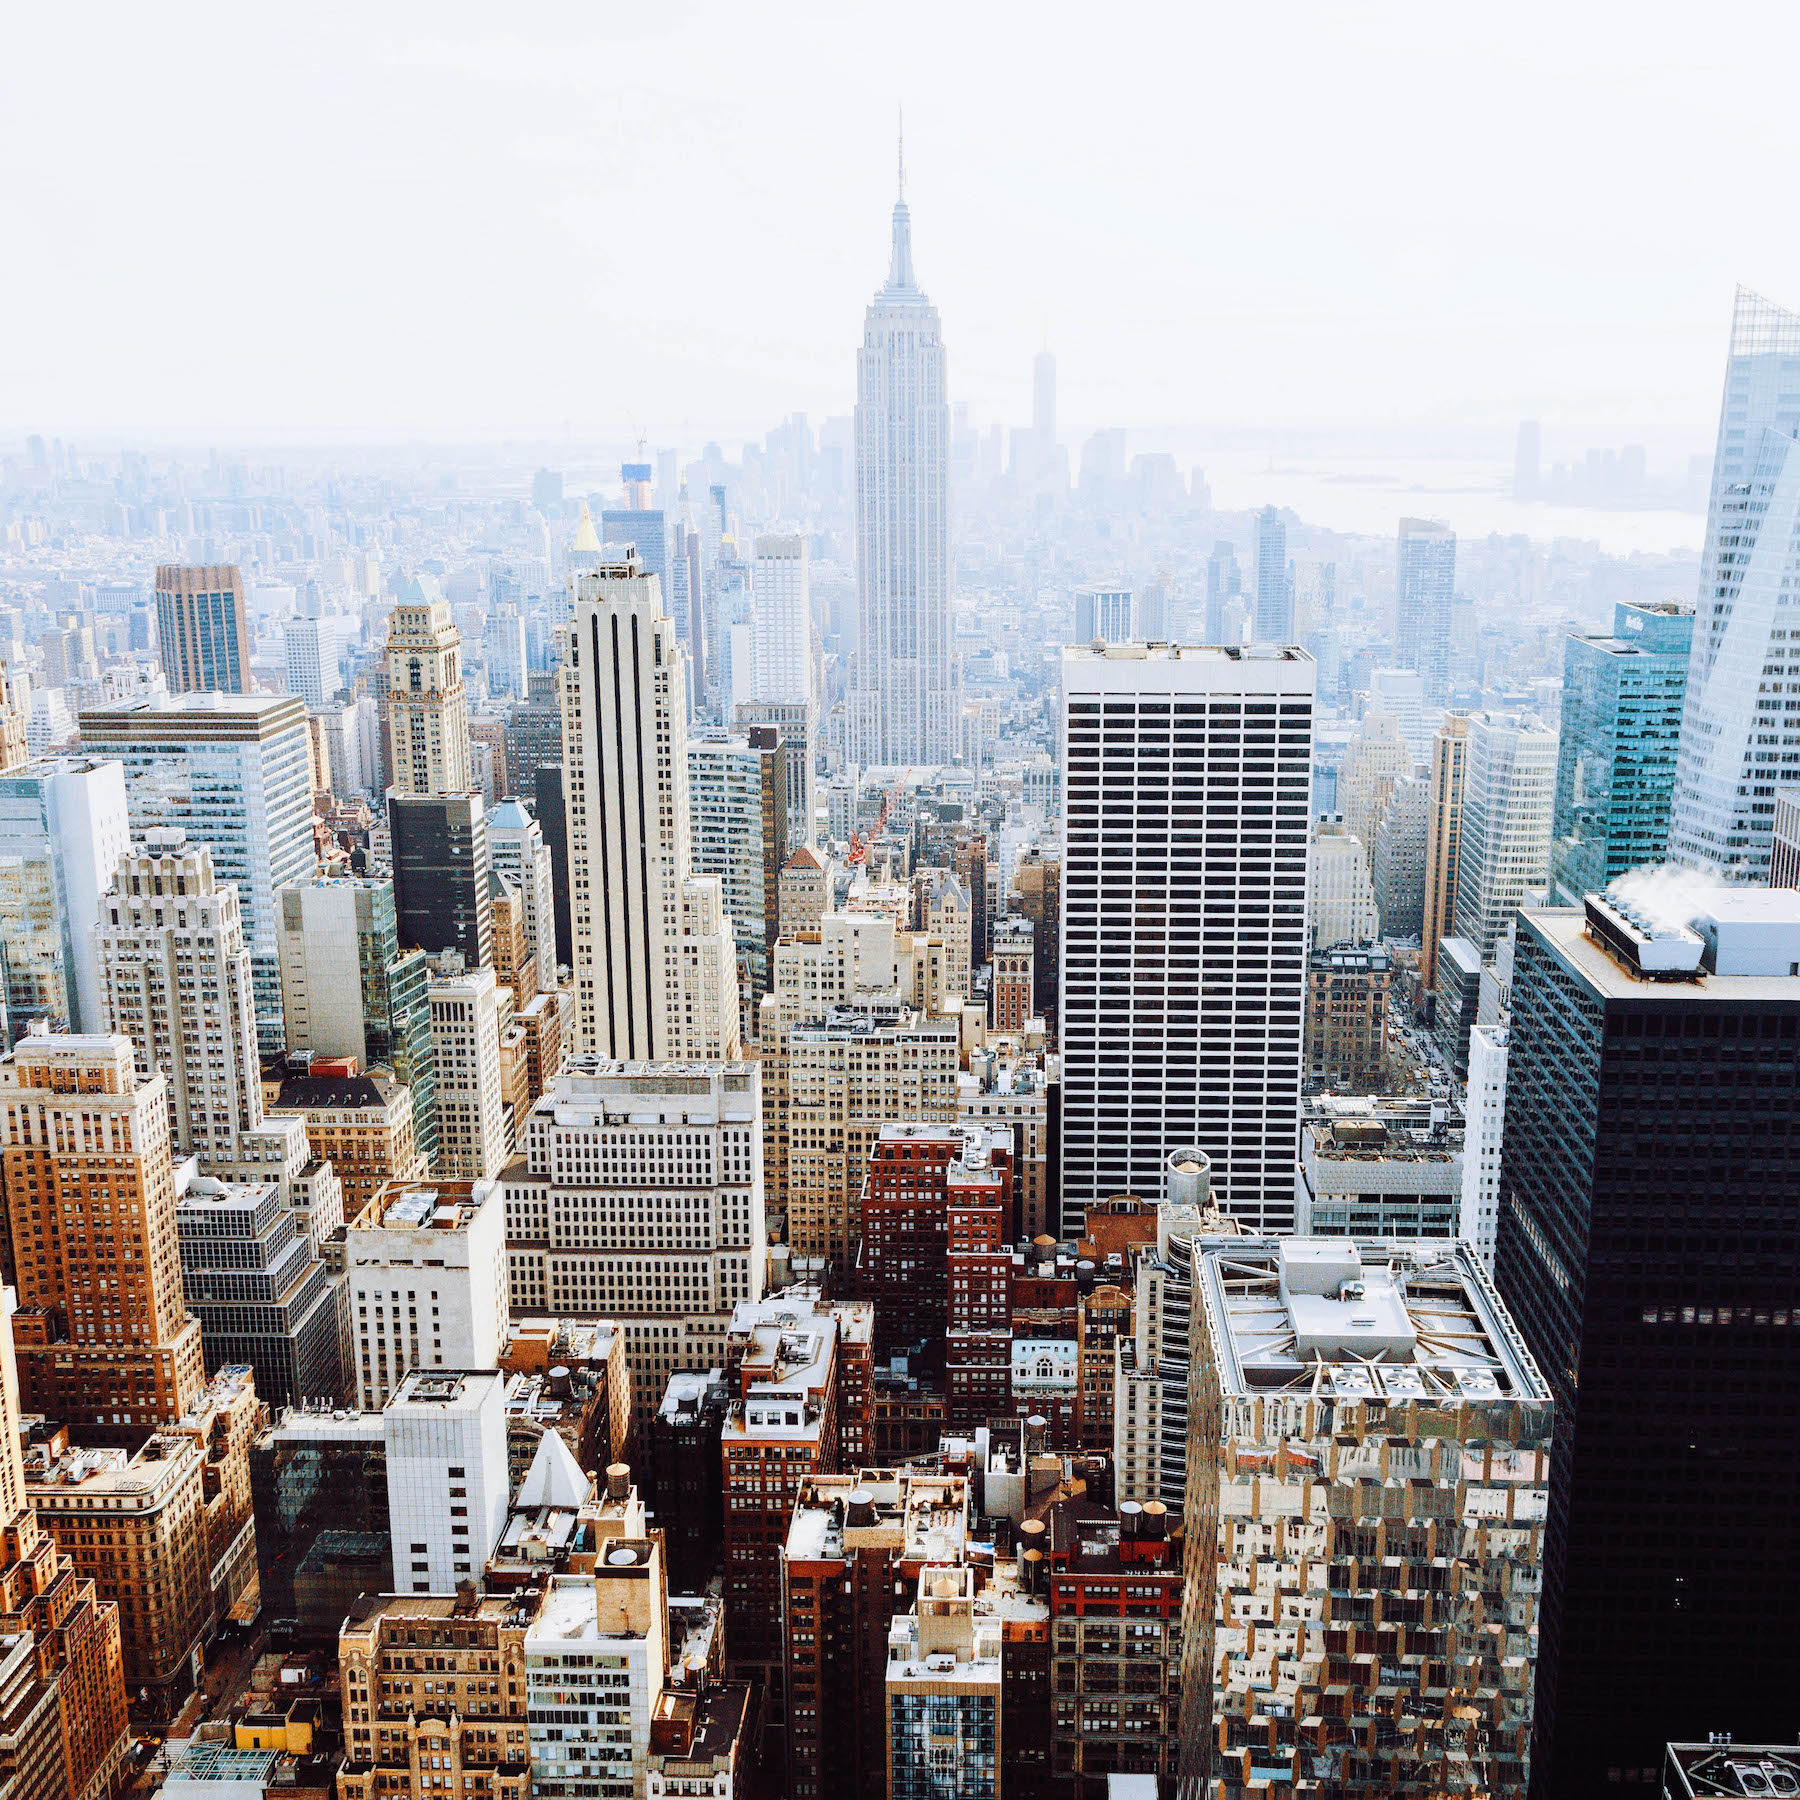 im Winter nach New York im Winter suelovesnyc_susan_fengler_blog_new_york_im_winter_nach_new_york_nyc